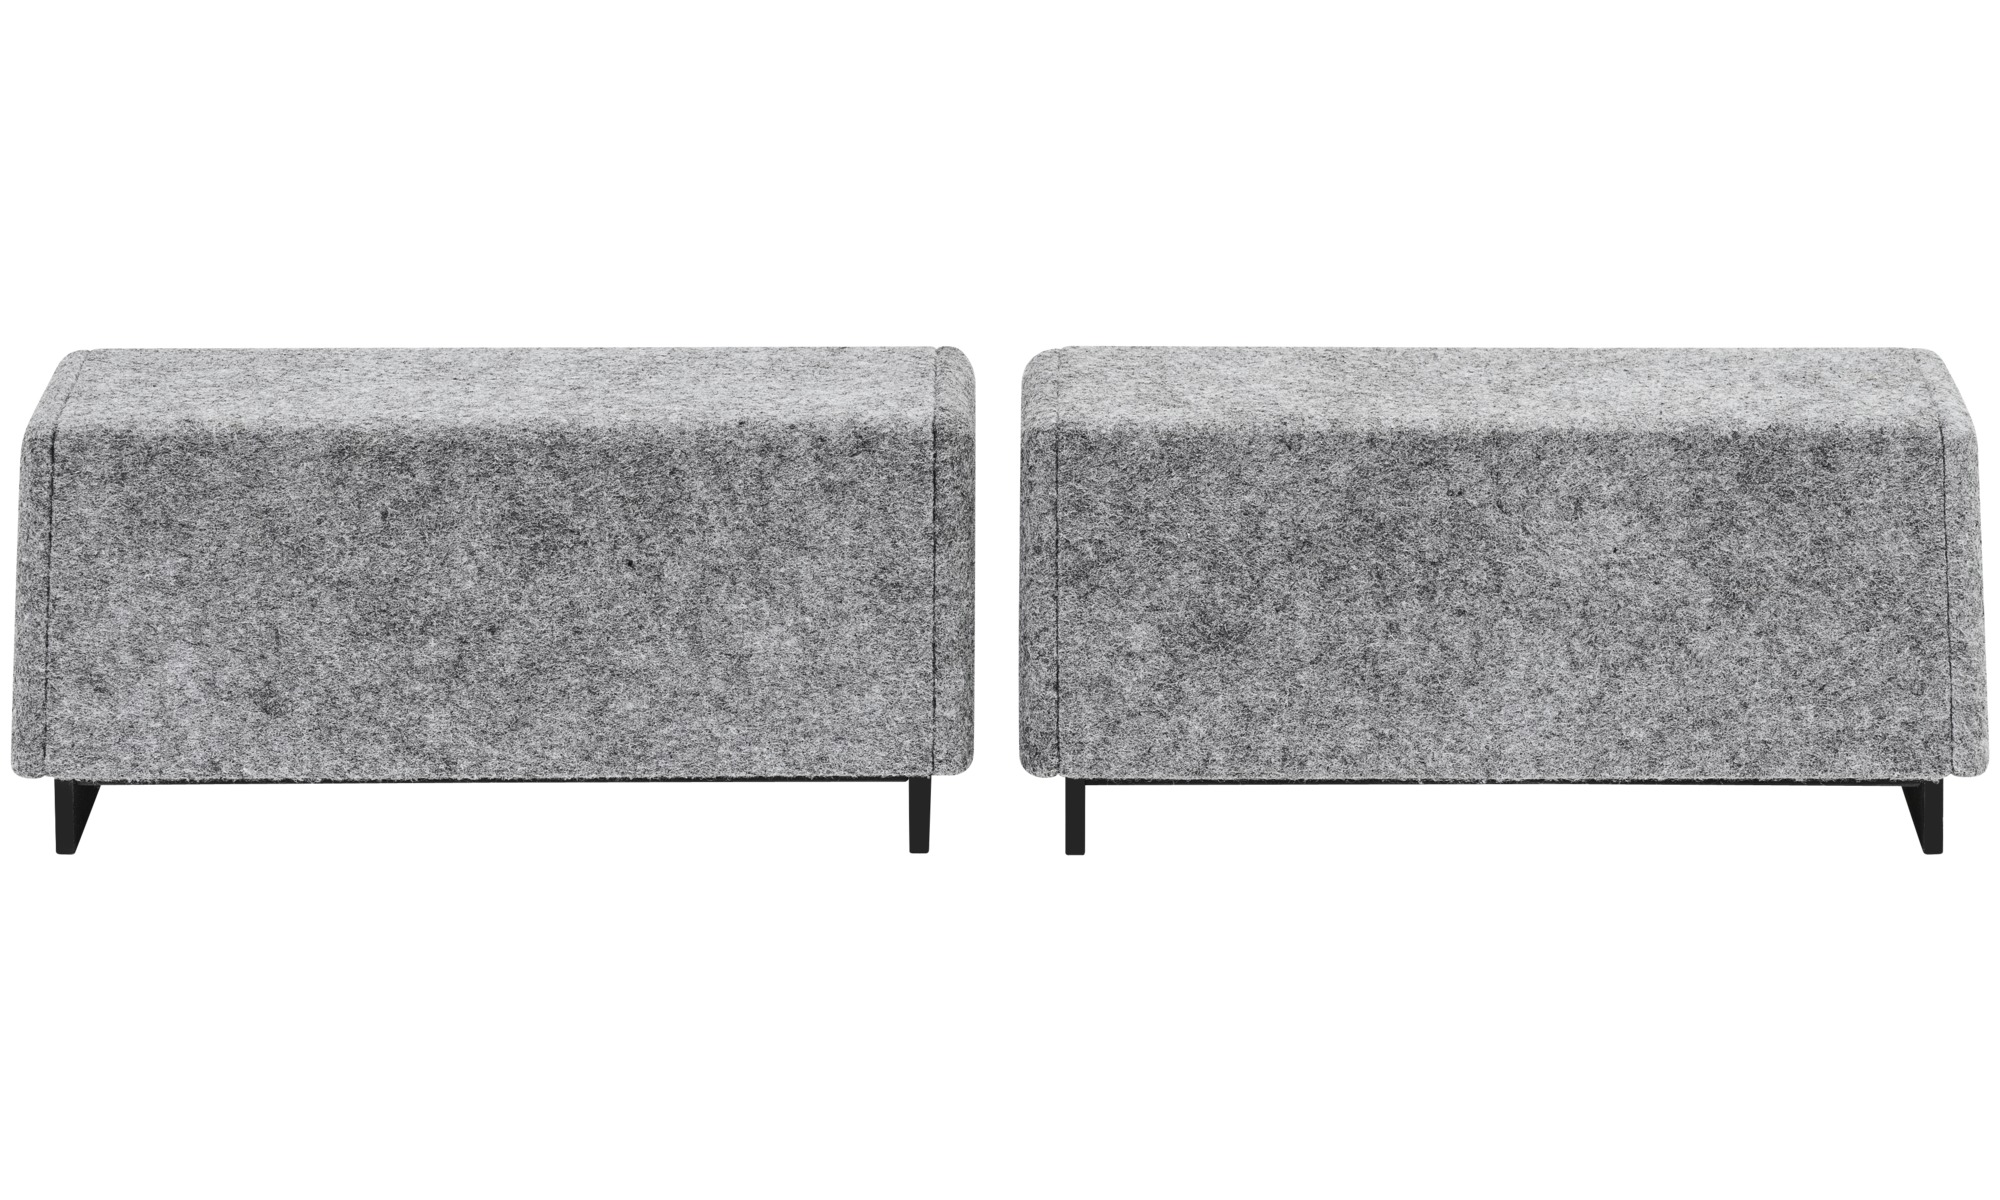 Desks - Cupertino loud speakers (set) - Grey - Speaker front